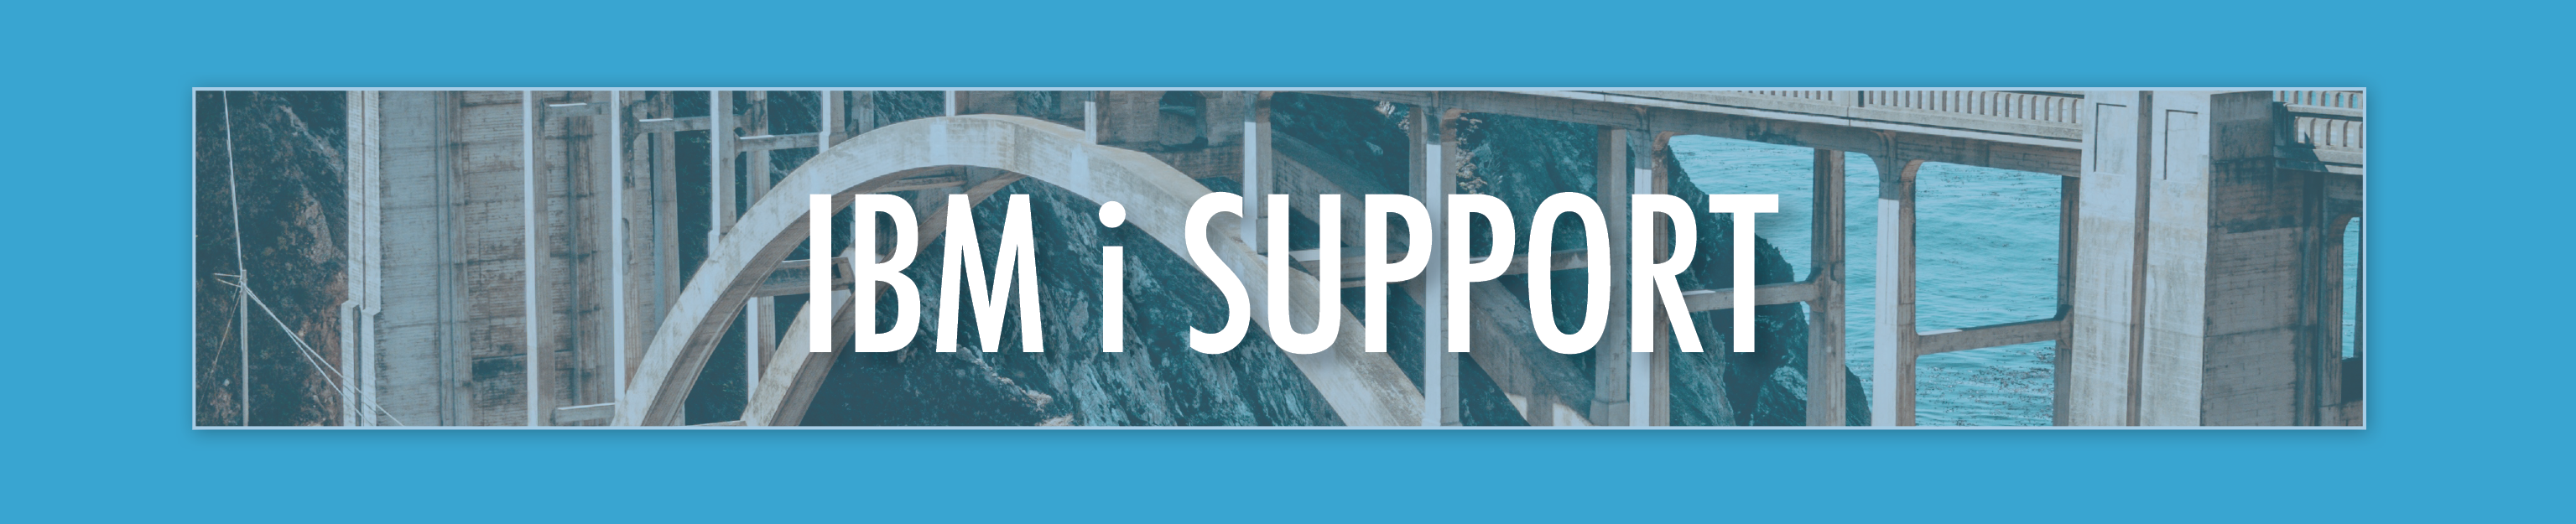 Newsletter_banner_support.png